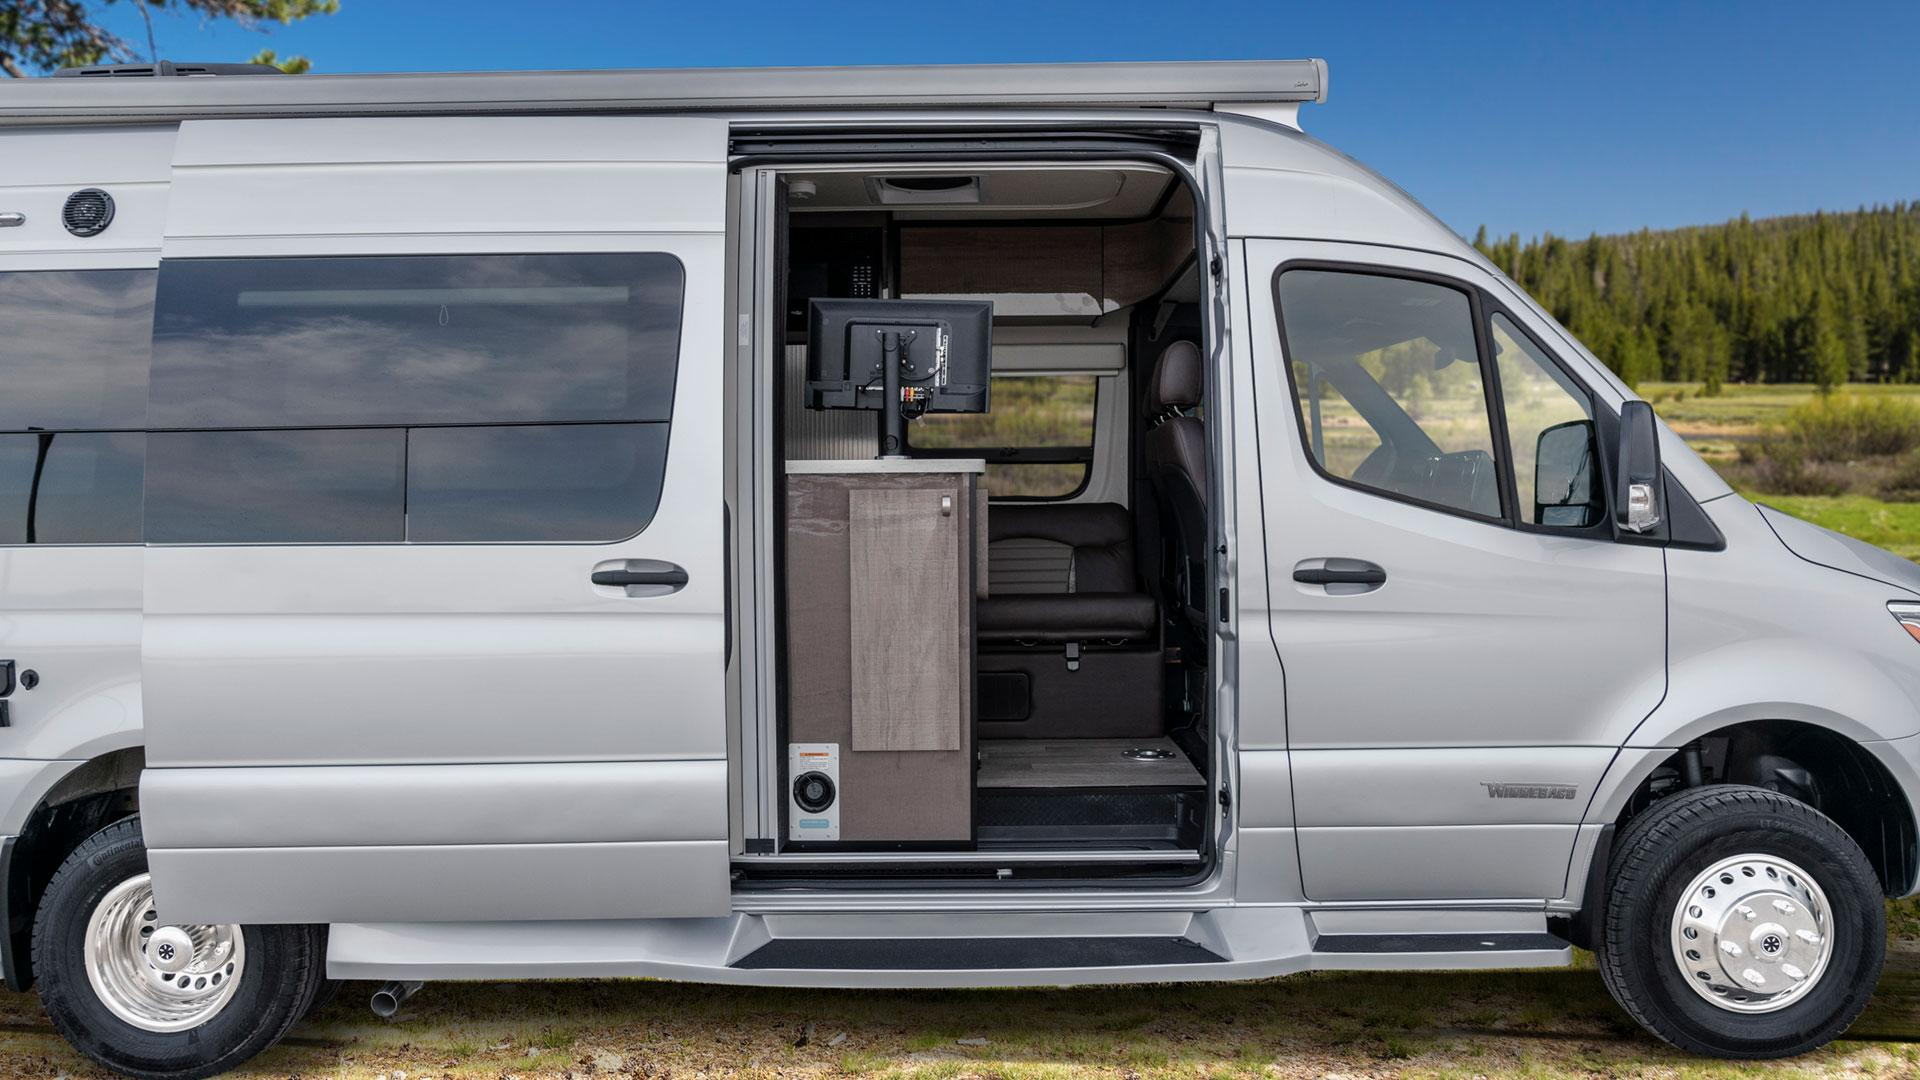 Ford Nugget Camper Van Kitchen Roll Holder Tissue Tube Motor Home Freedom Travel